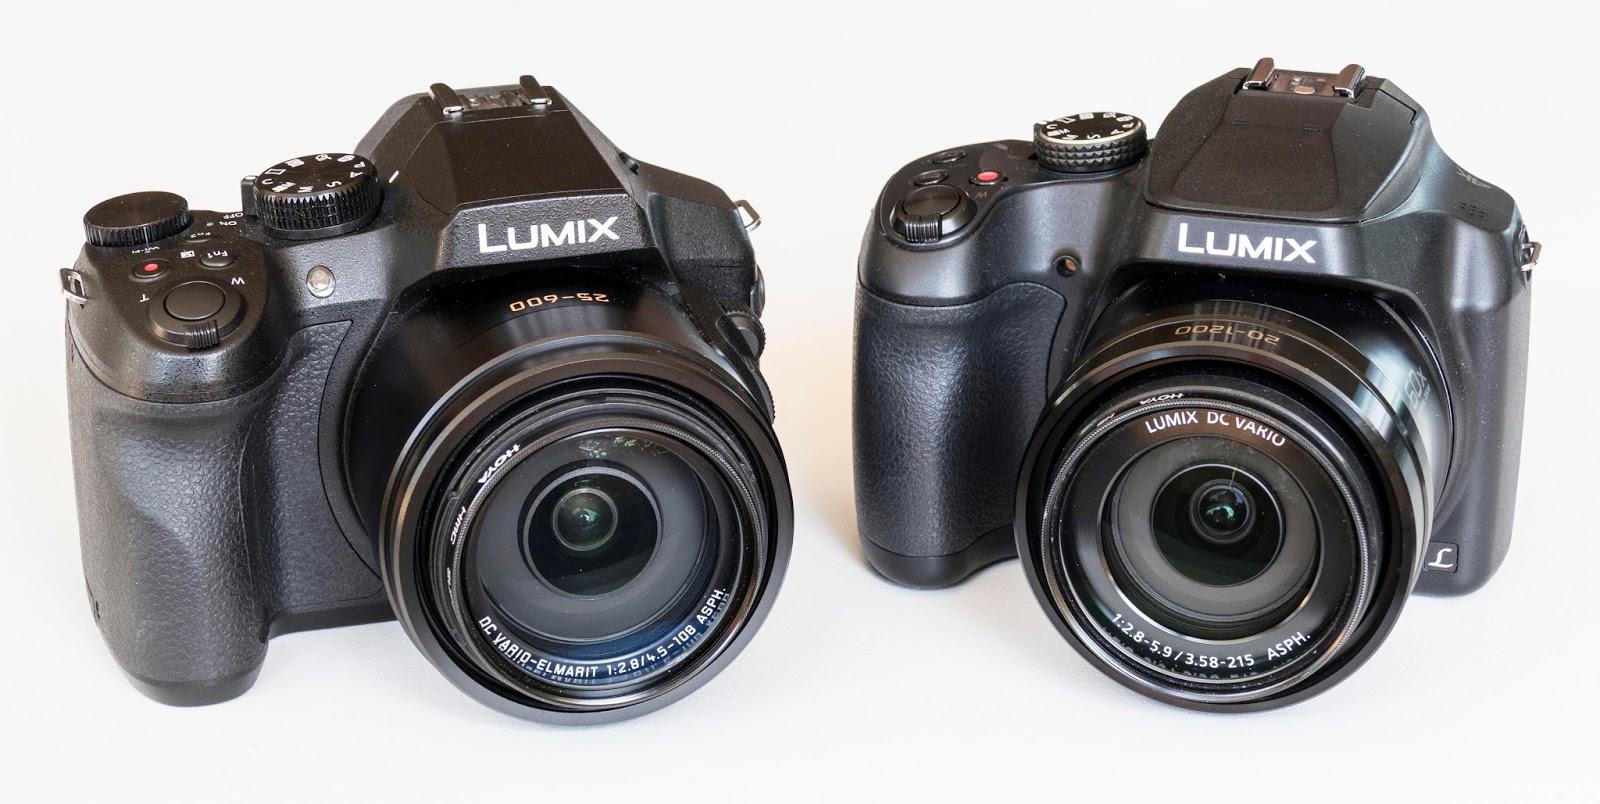 panasonic fz300 vs fz80 bridge camera comparison camera ergonomics